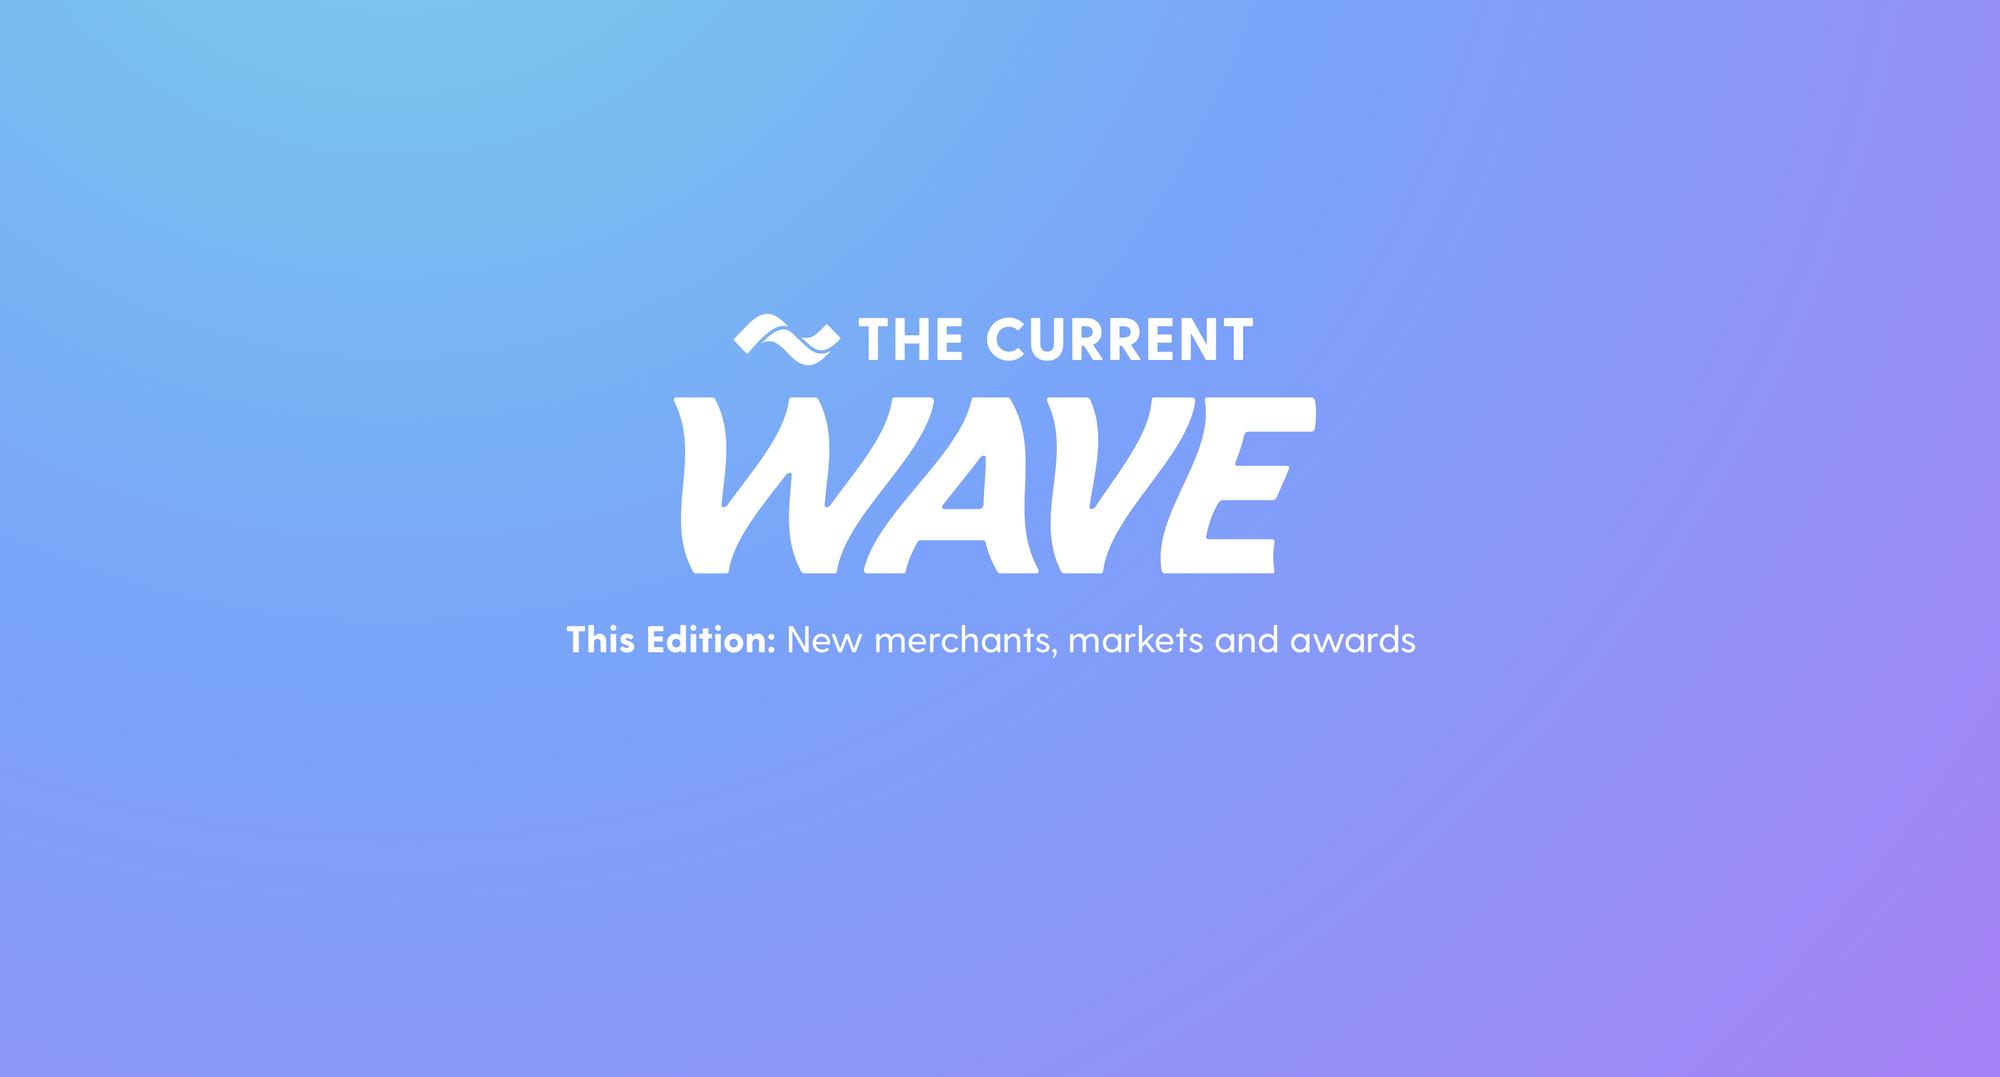 the-current-wave-merchants-markets-awards